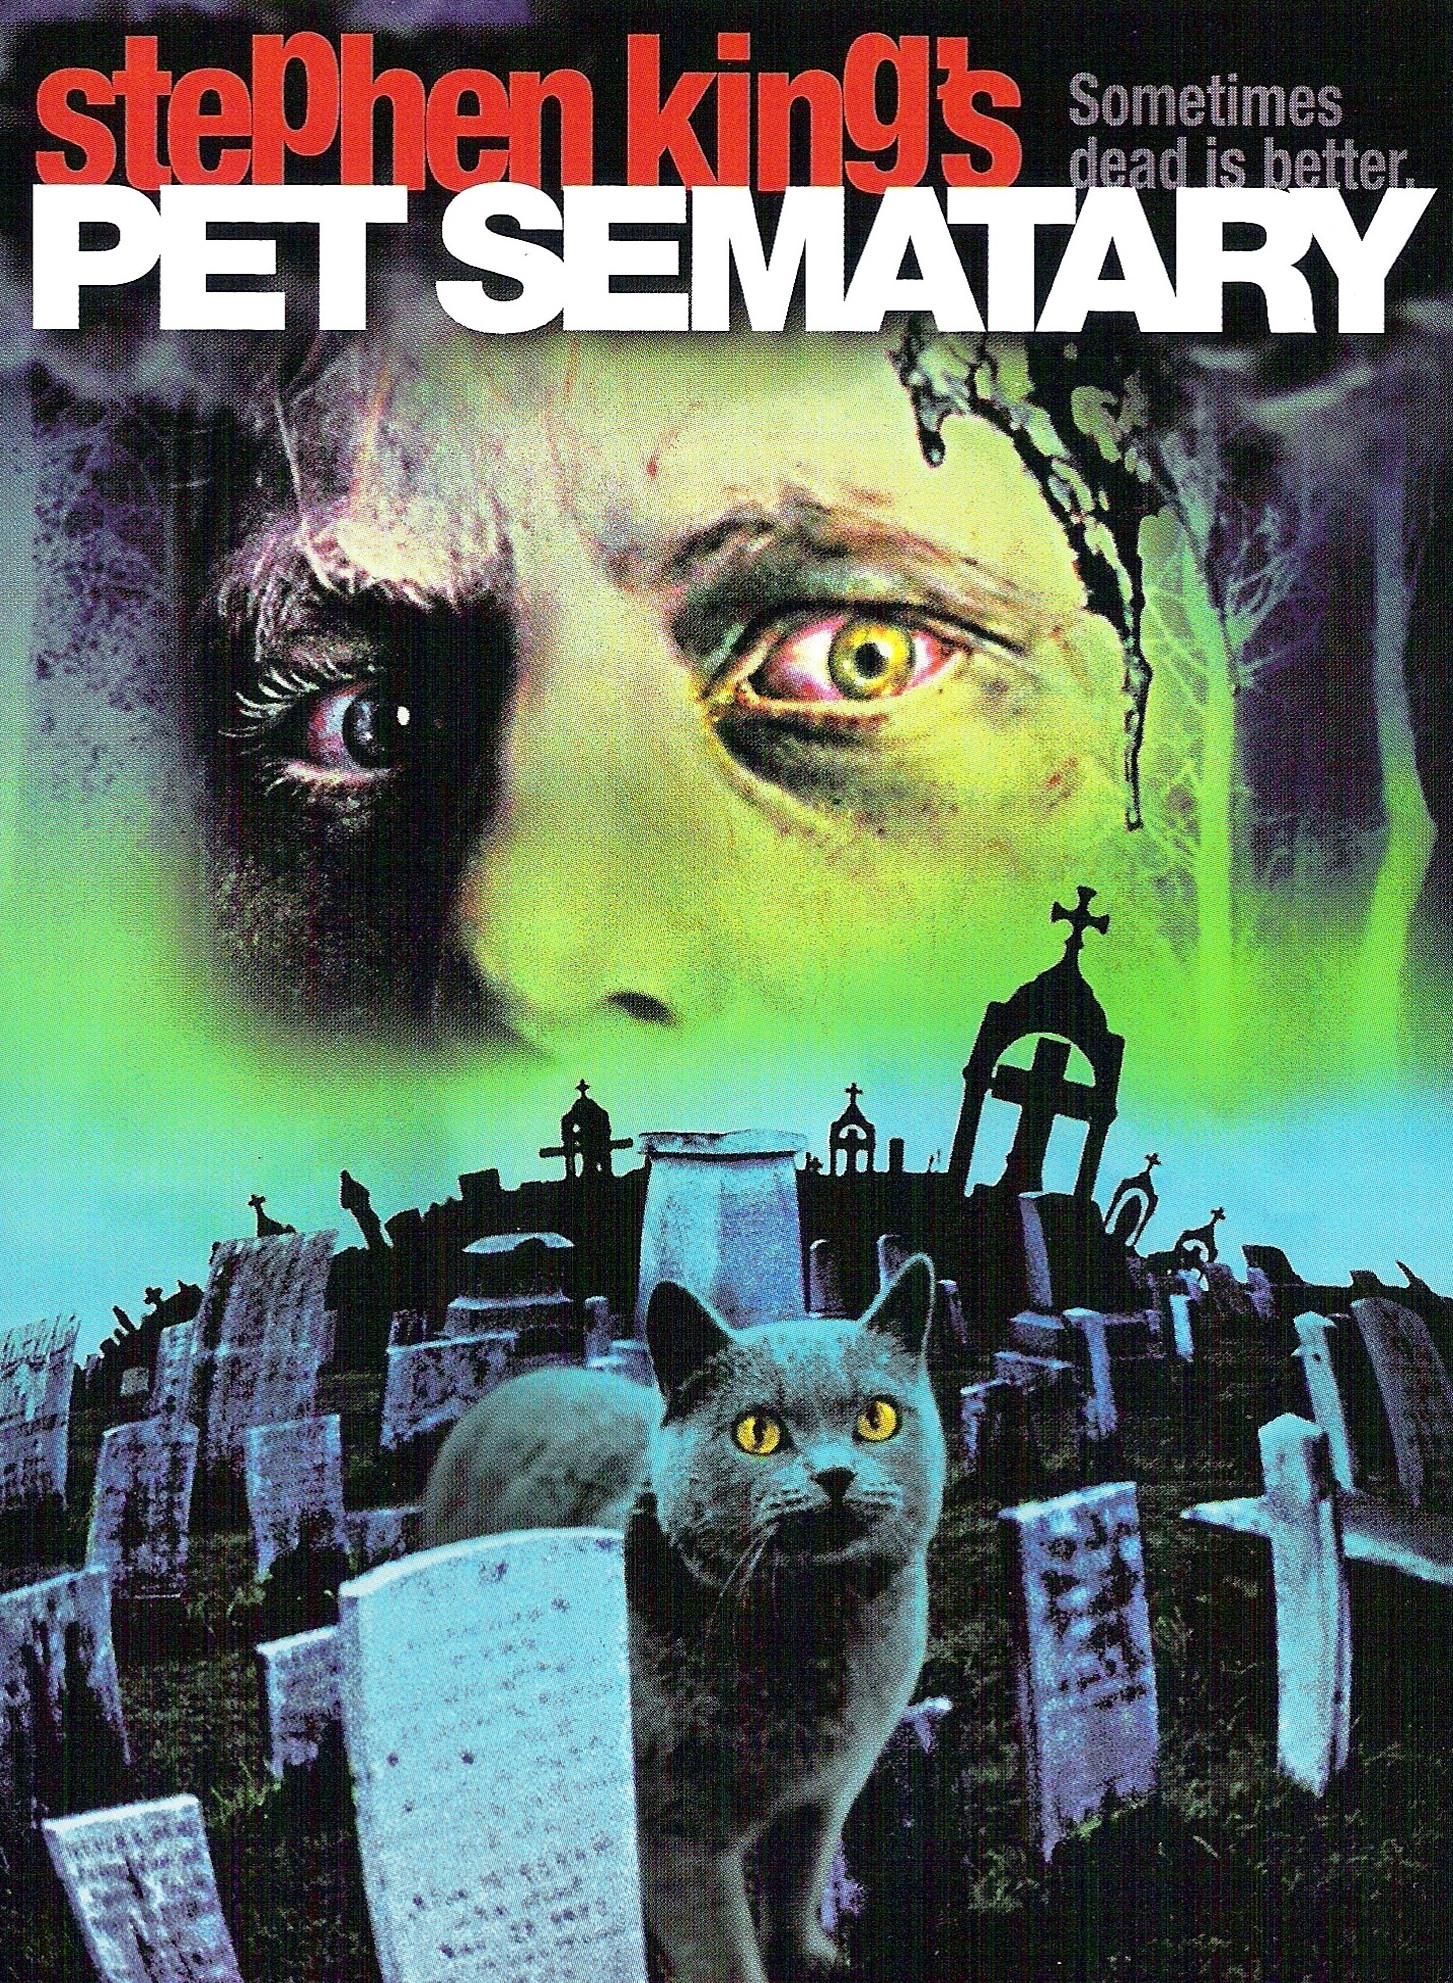 Pet Sematary 1989 Stephen King cult horror movie poster print